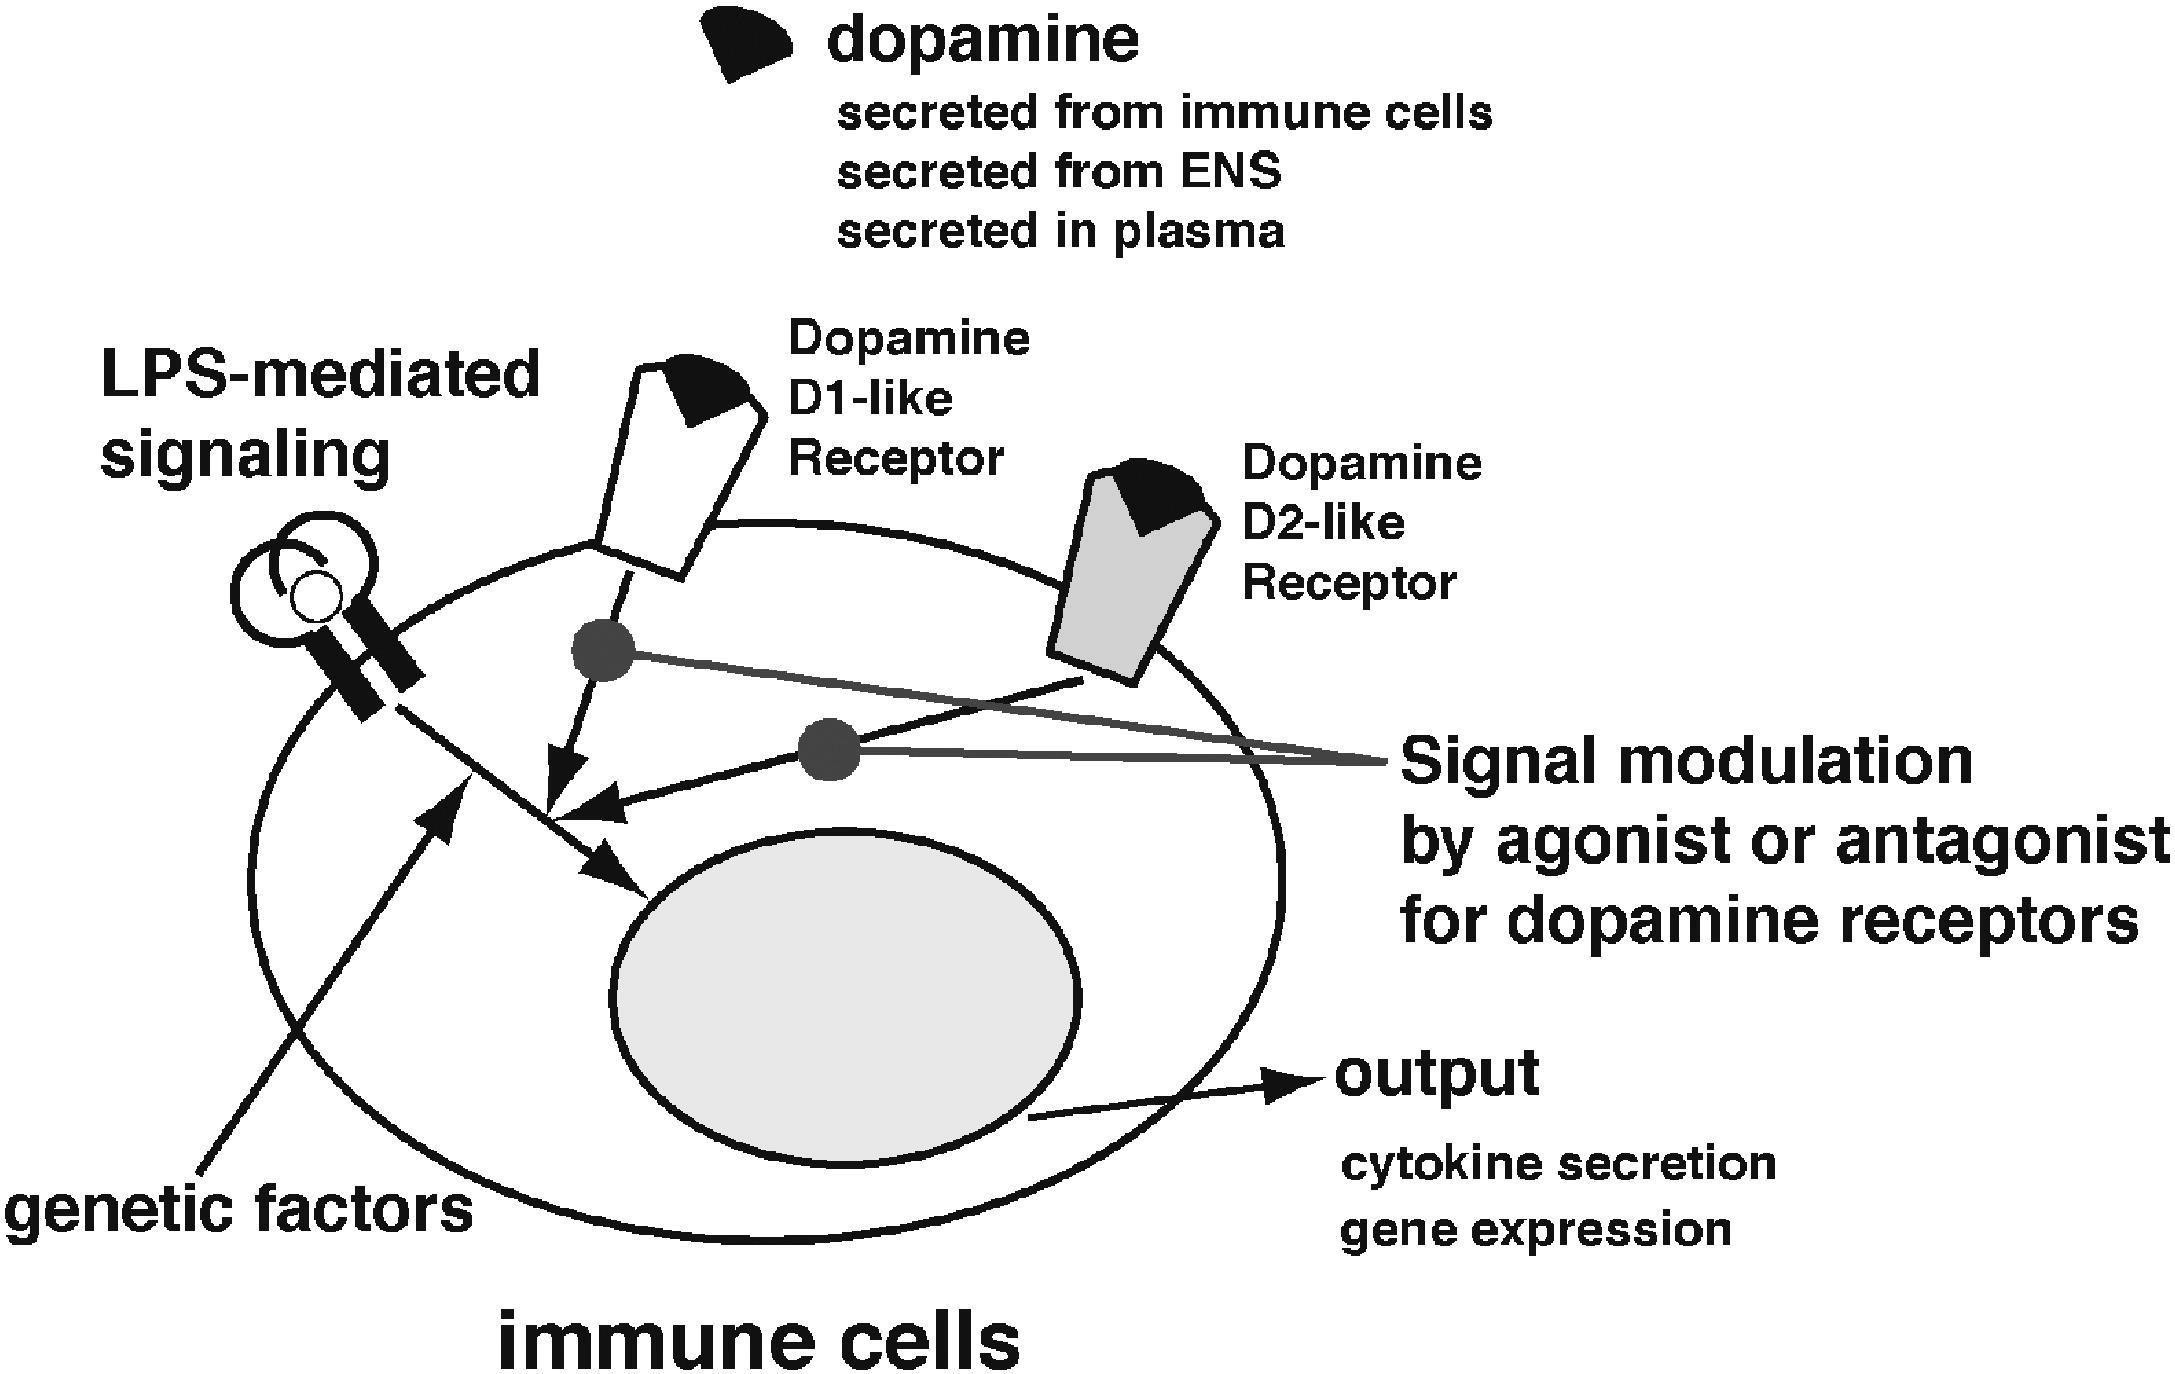 Berberine Is A Dopamine D1 And D2 Like Receptor